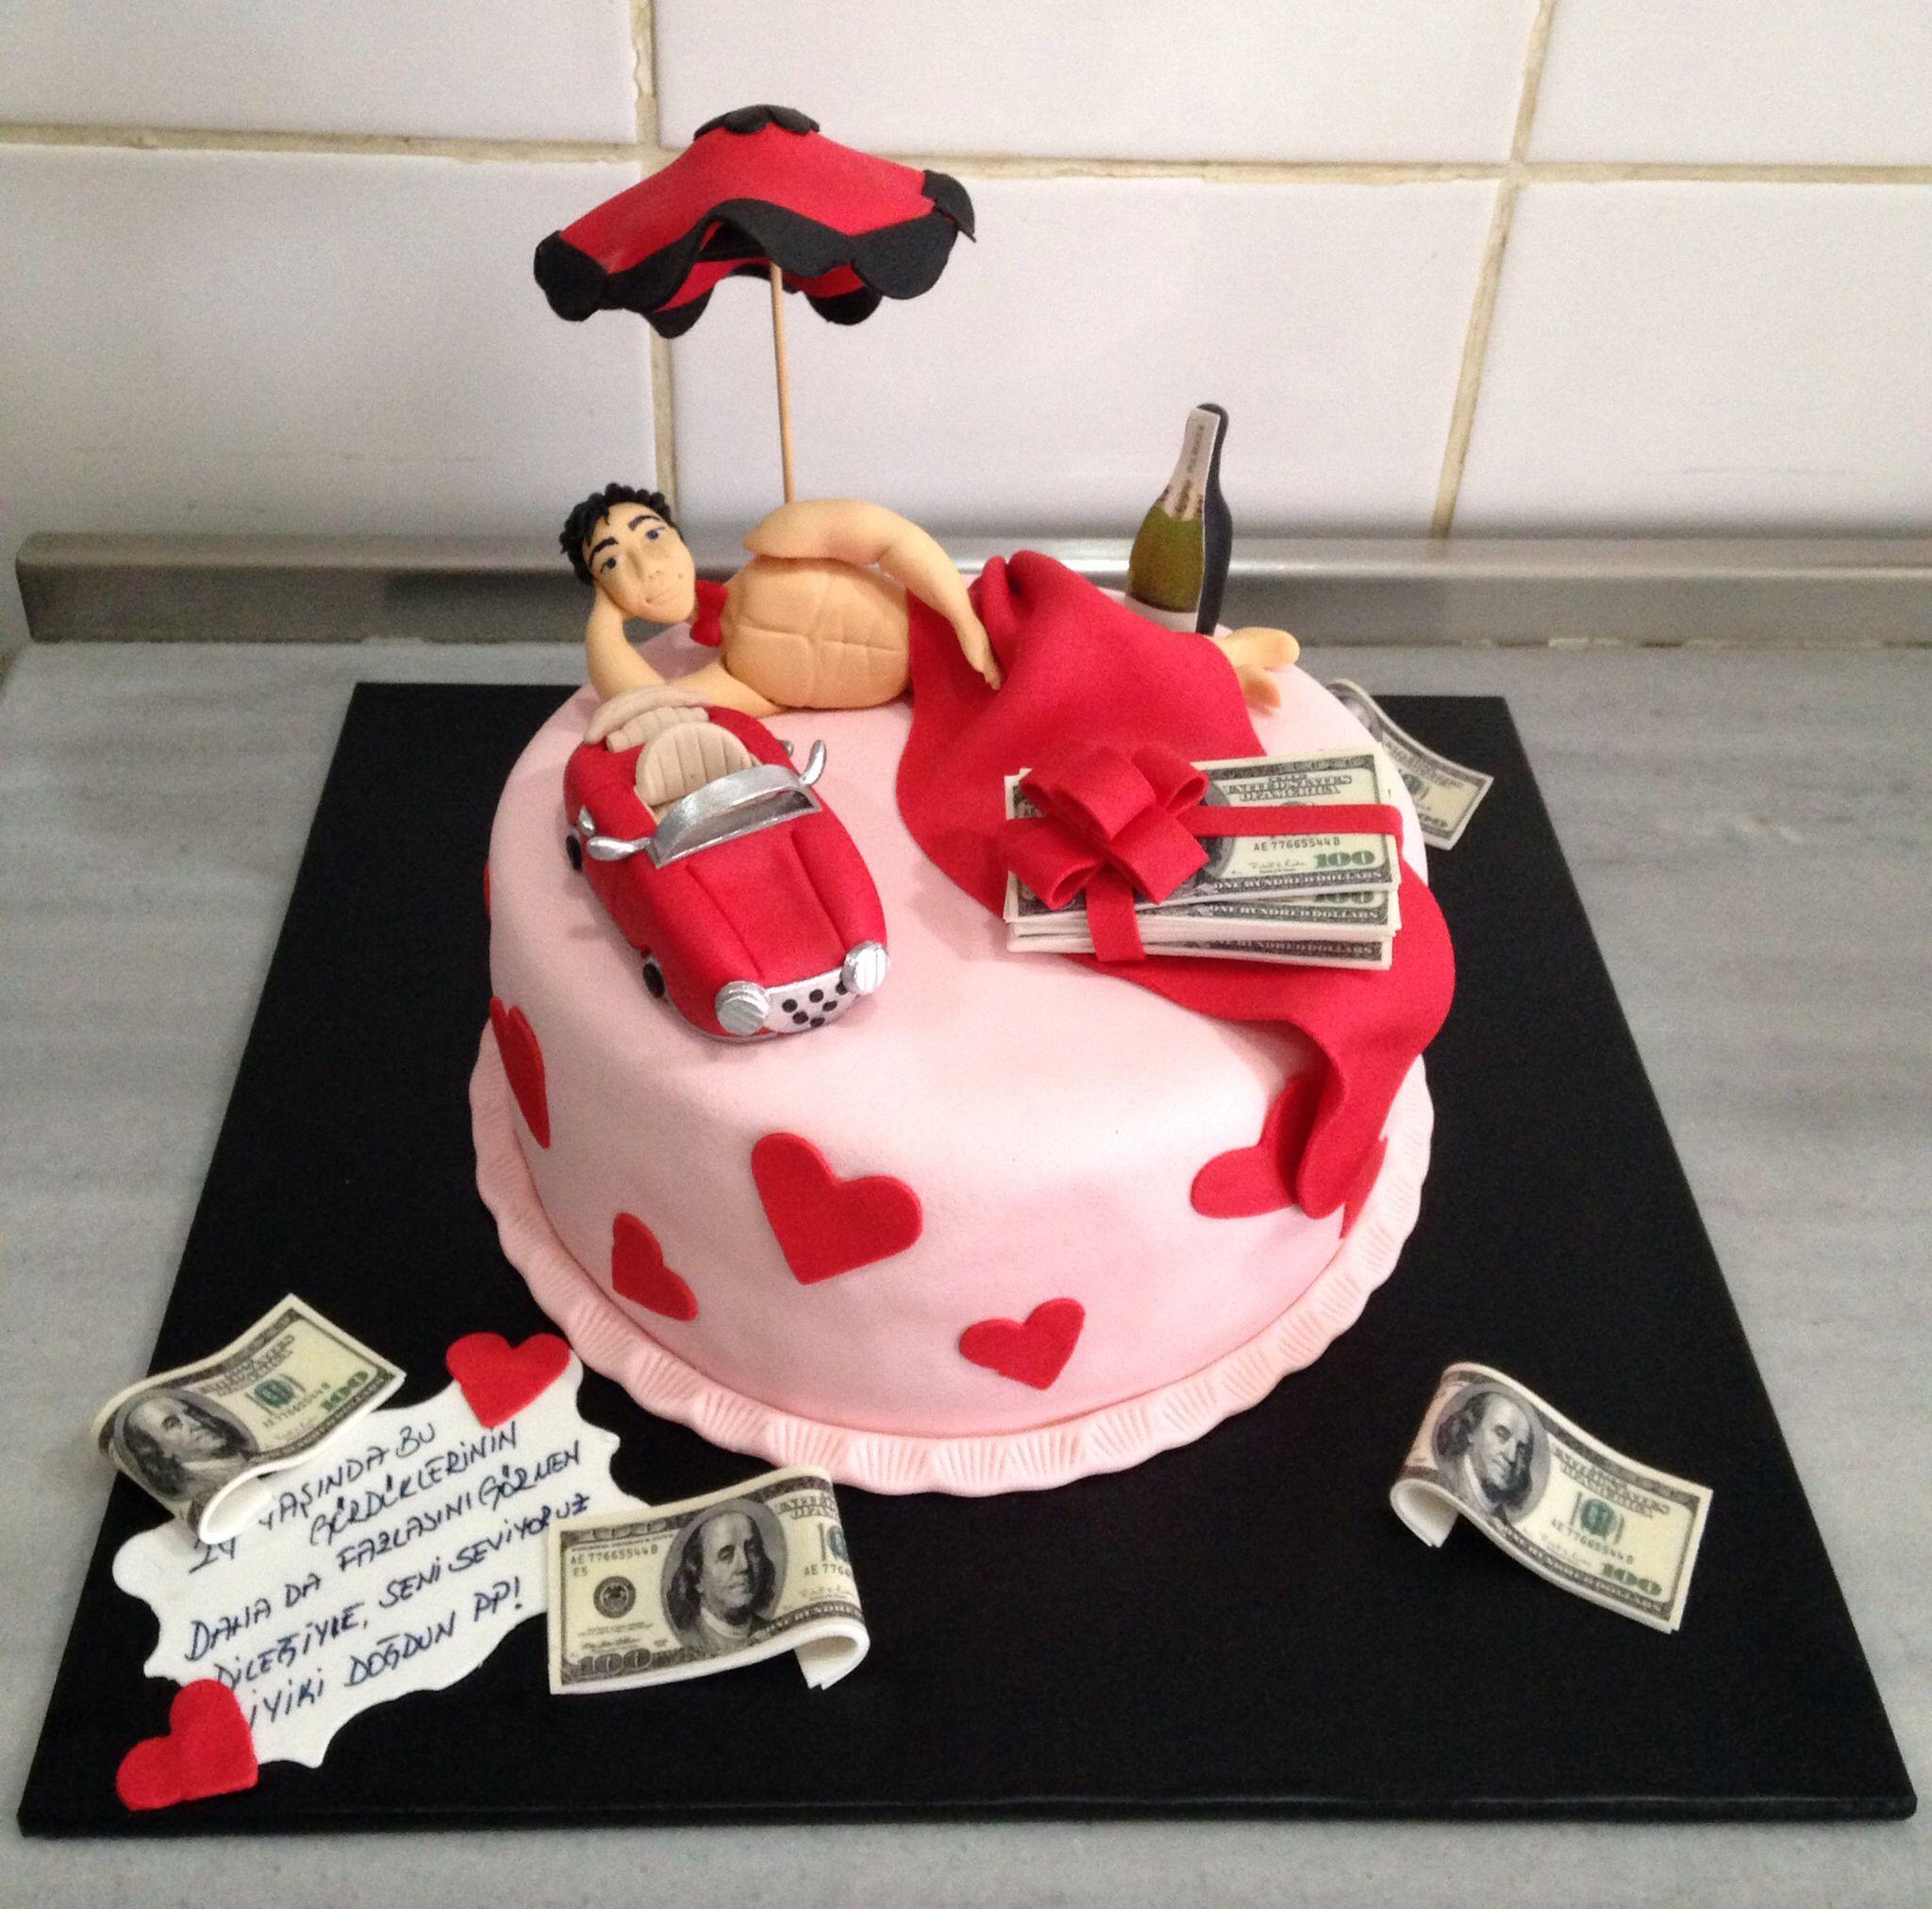 Amusing phrase sexy man with birthday cake shall